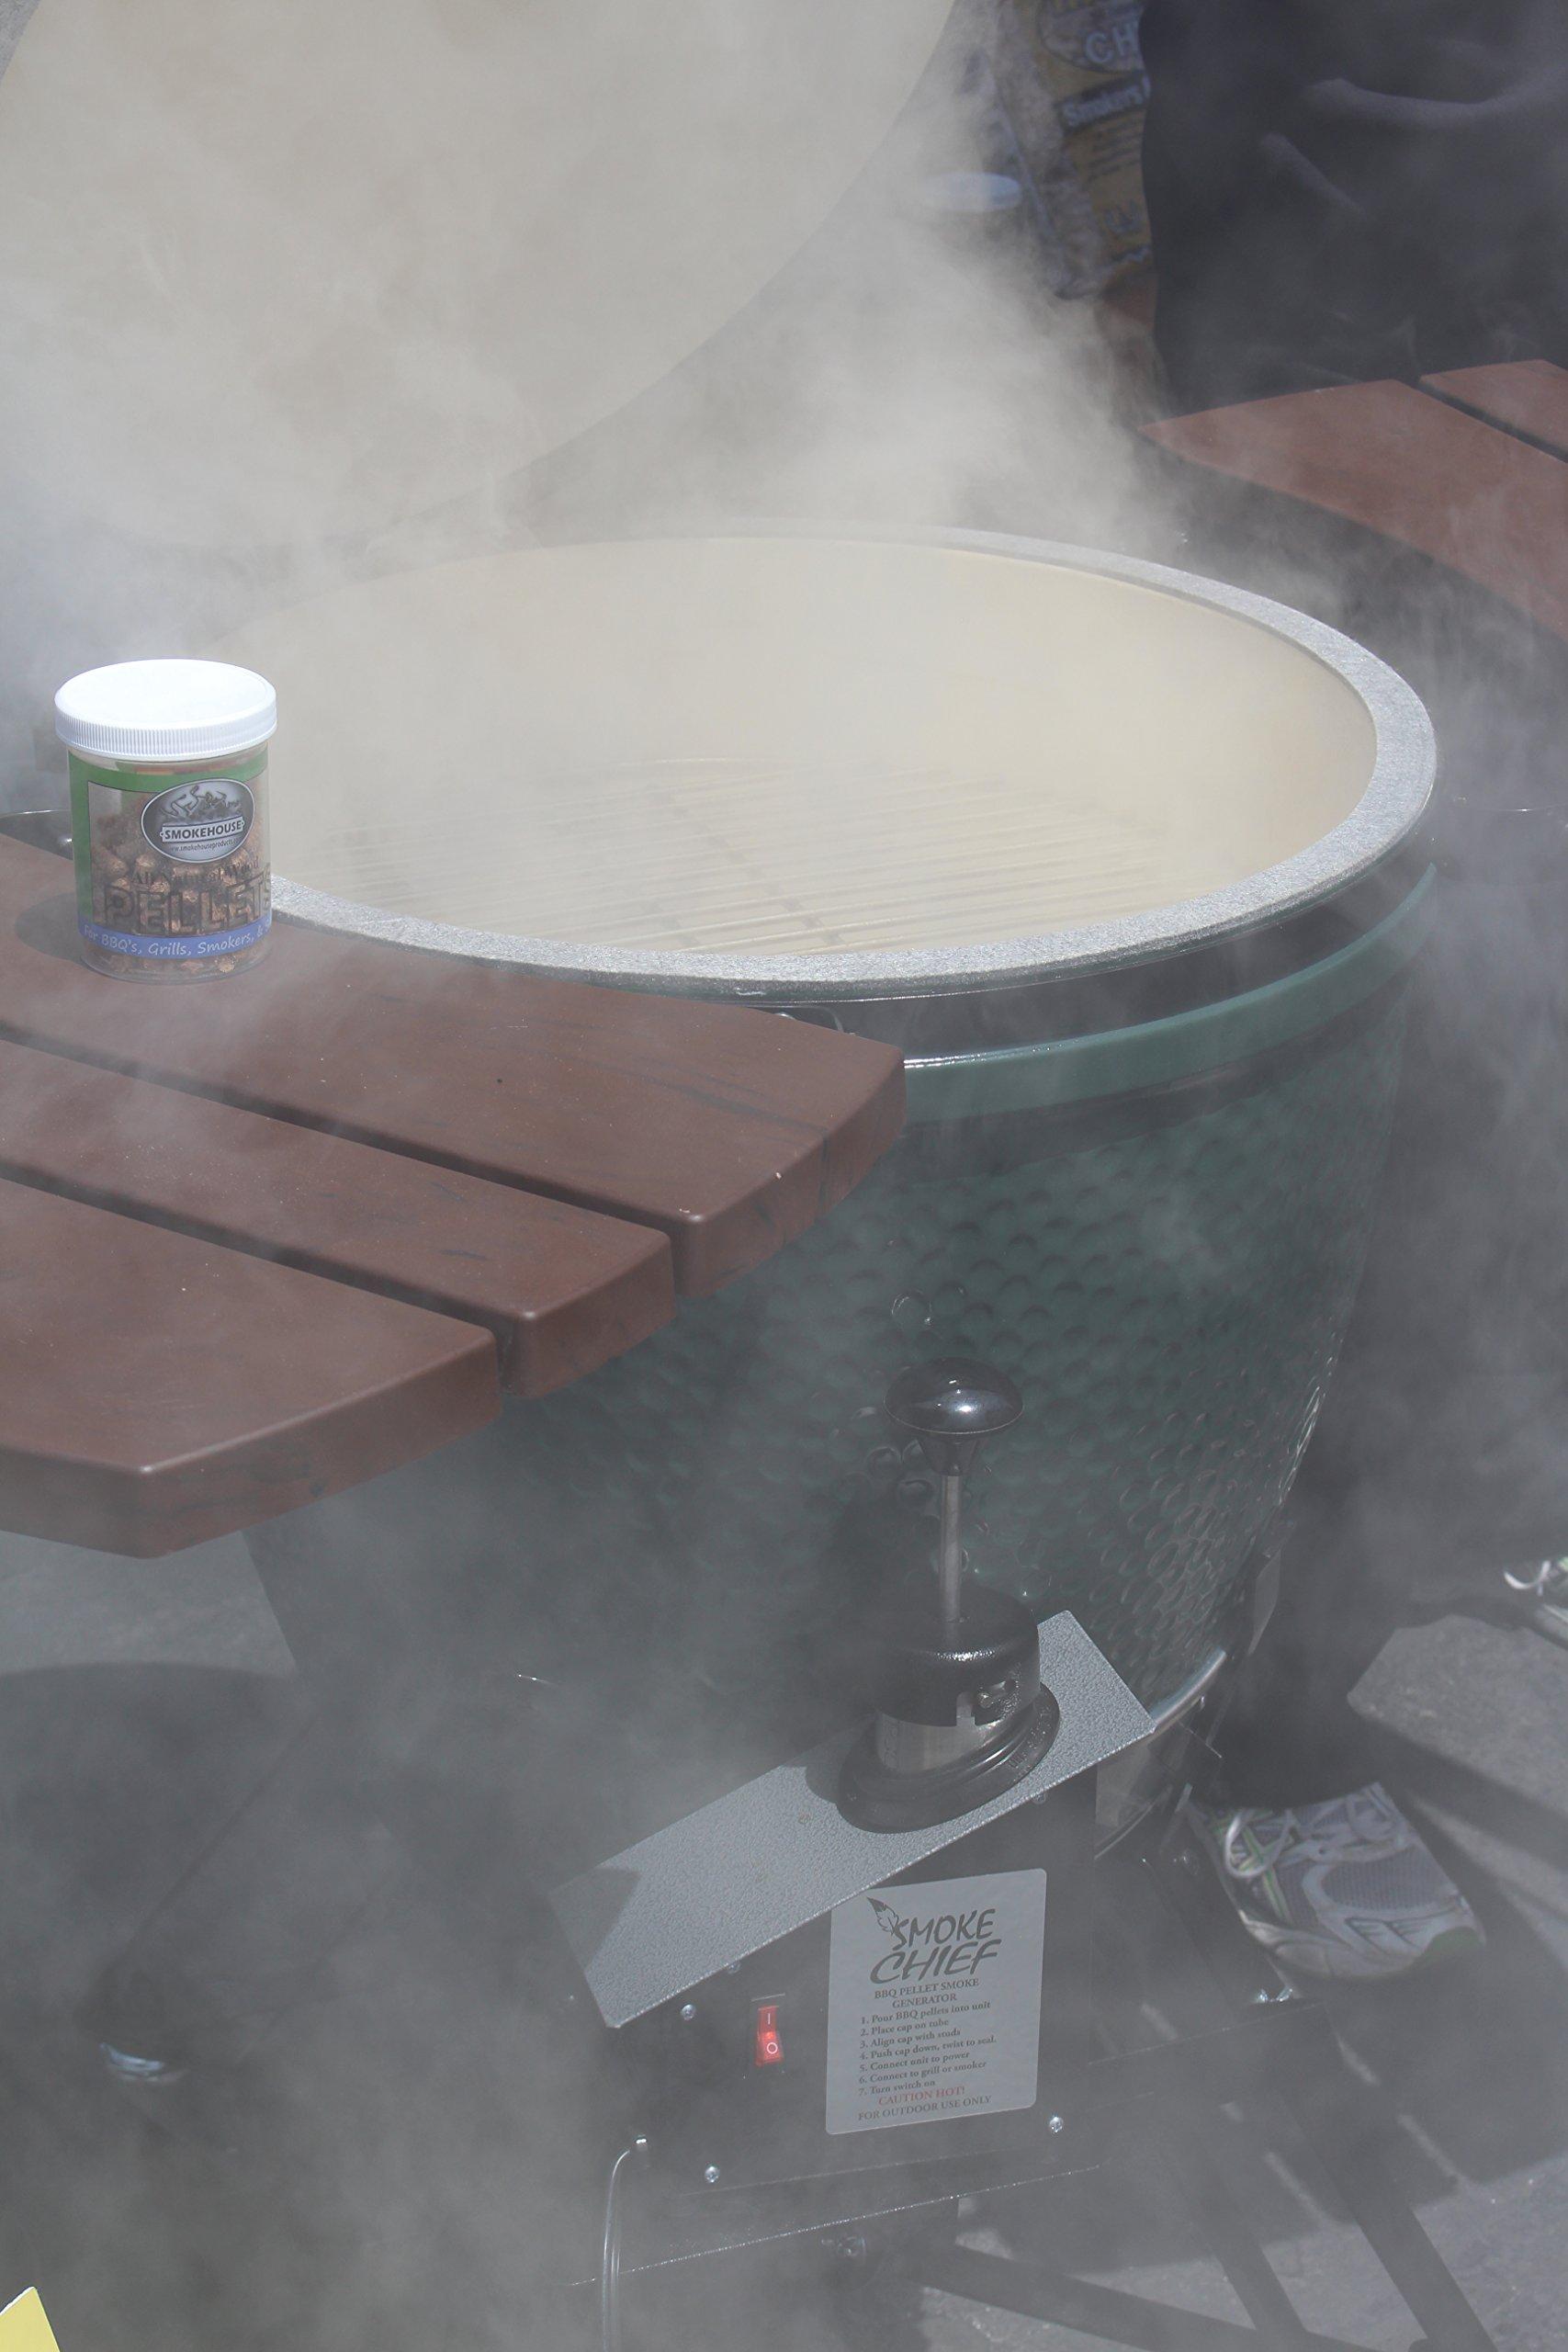 Smokehouse Products 9500-000-0000 Smoke Chief Cold Smoke Generator by SmokeHouse (Image #2)